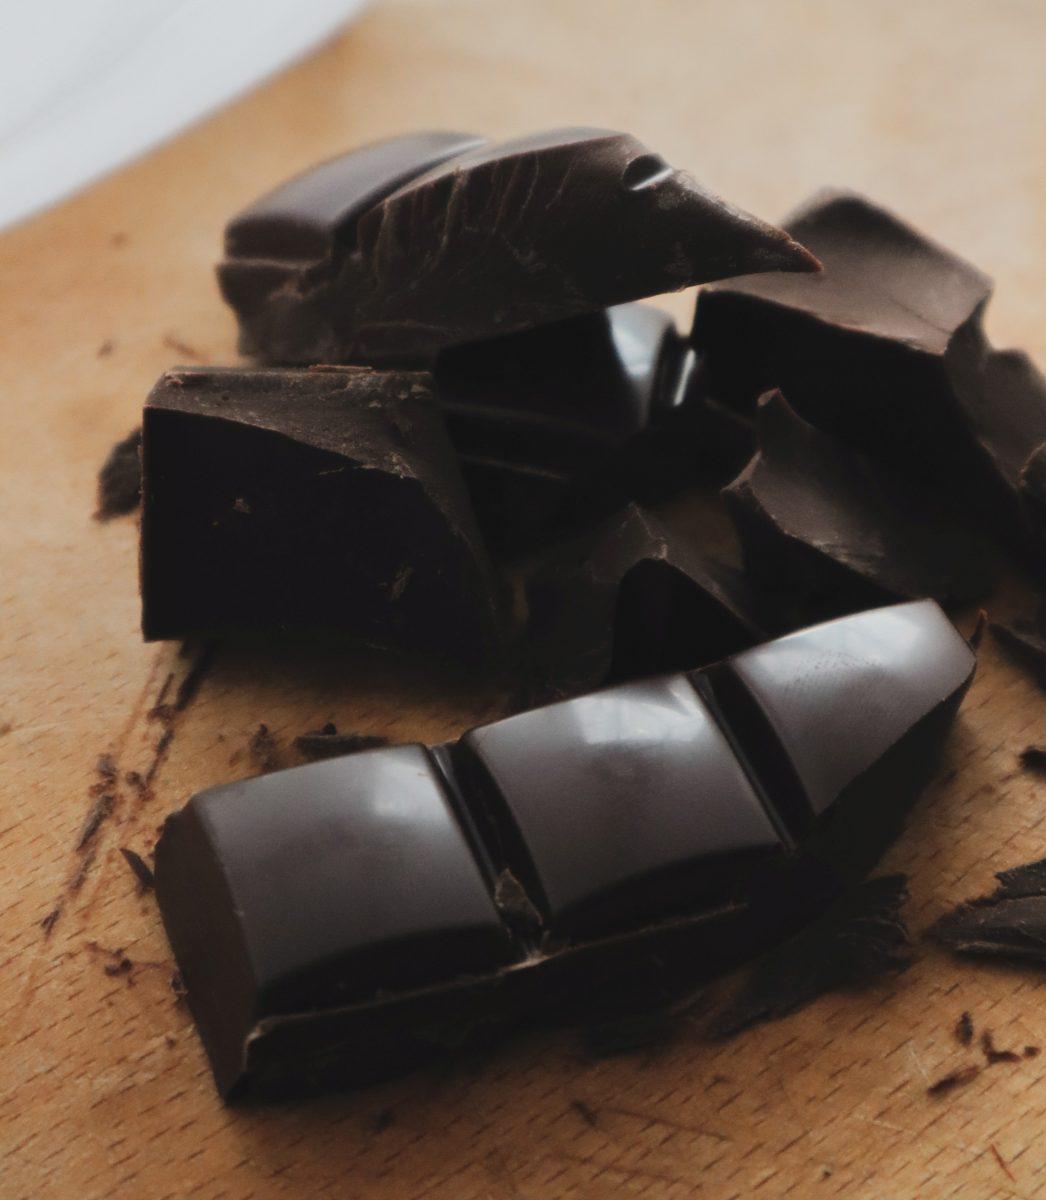 taisiia shestopal CrZVpPSDKaE unsplash 1 scaled - Comer chocolate alivia os sintomas de TPM?